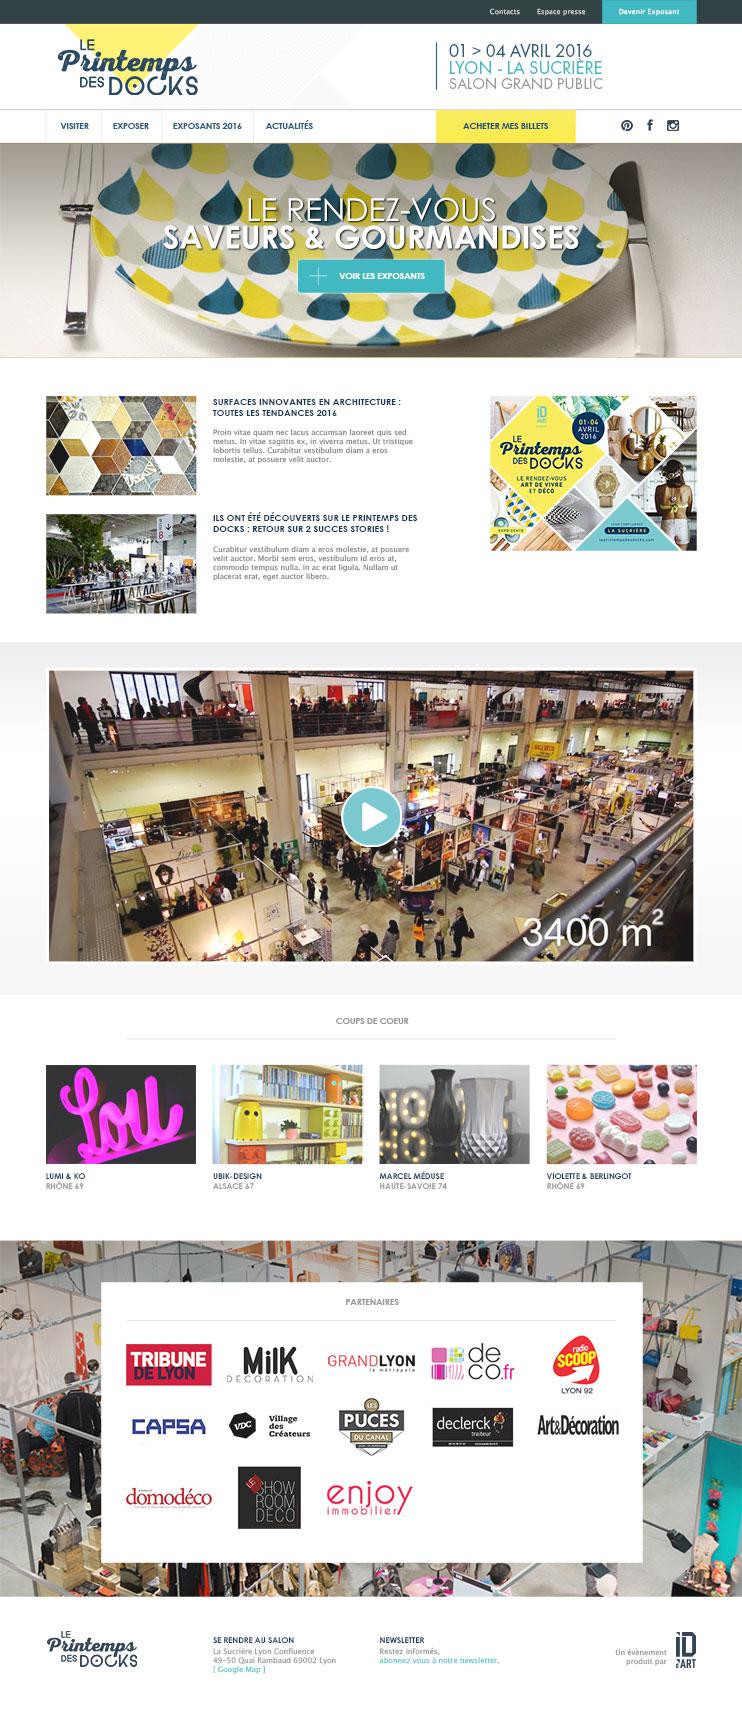 printempsdesdocks-webdesign